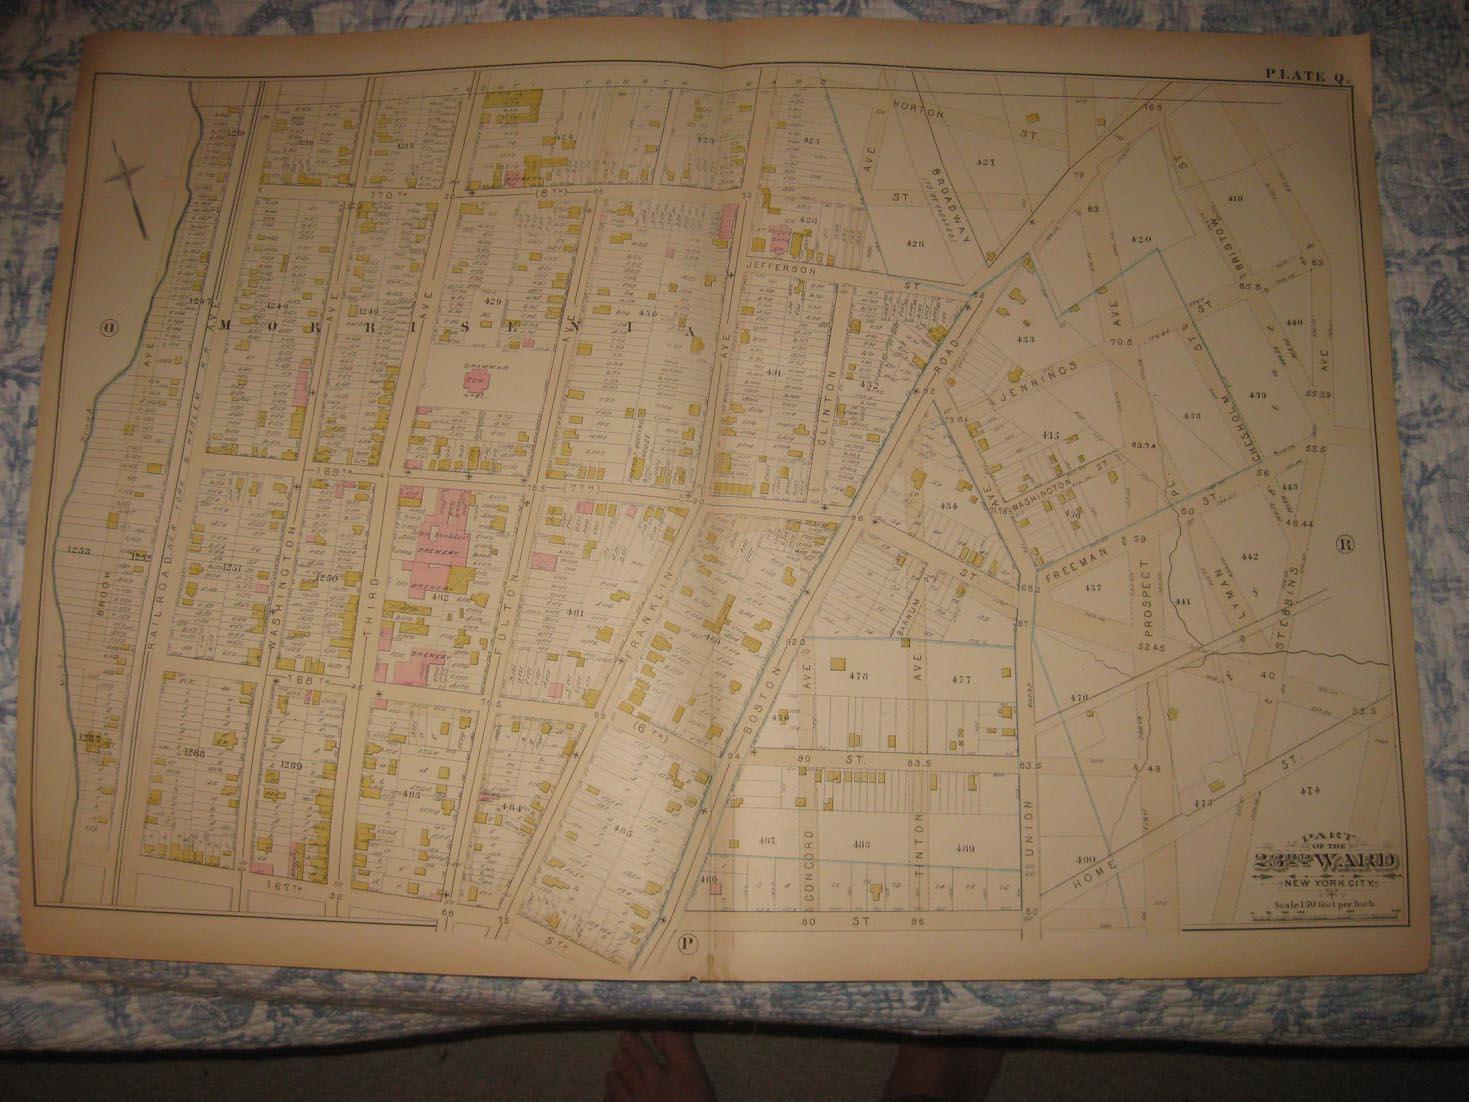 ANTIQUE 1882 23RD WARD MORRISANIA BRONX NEW YORK CITY